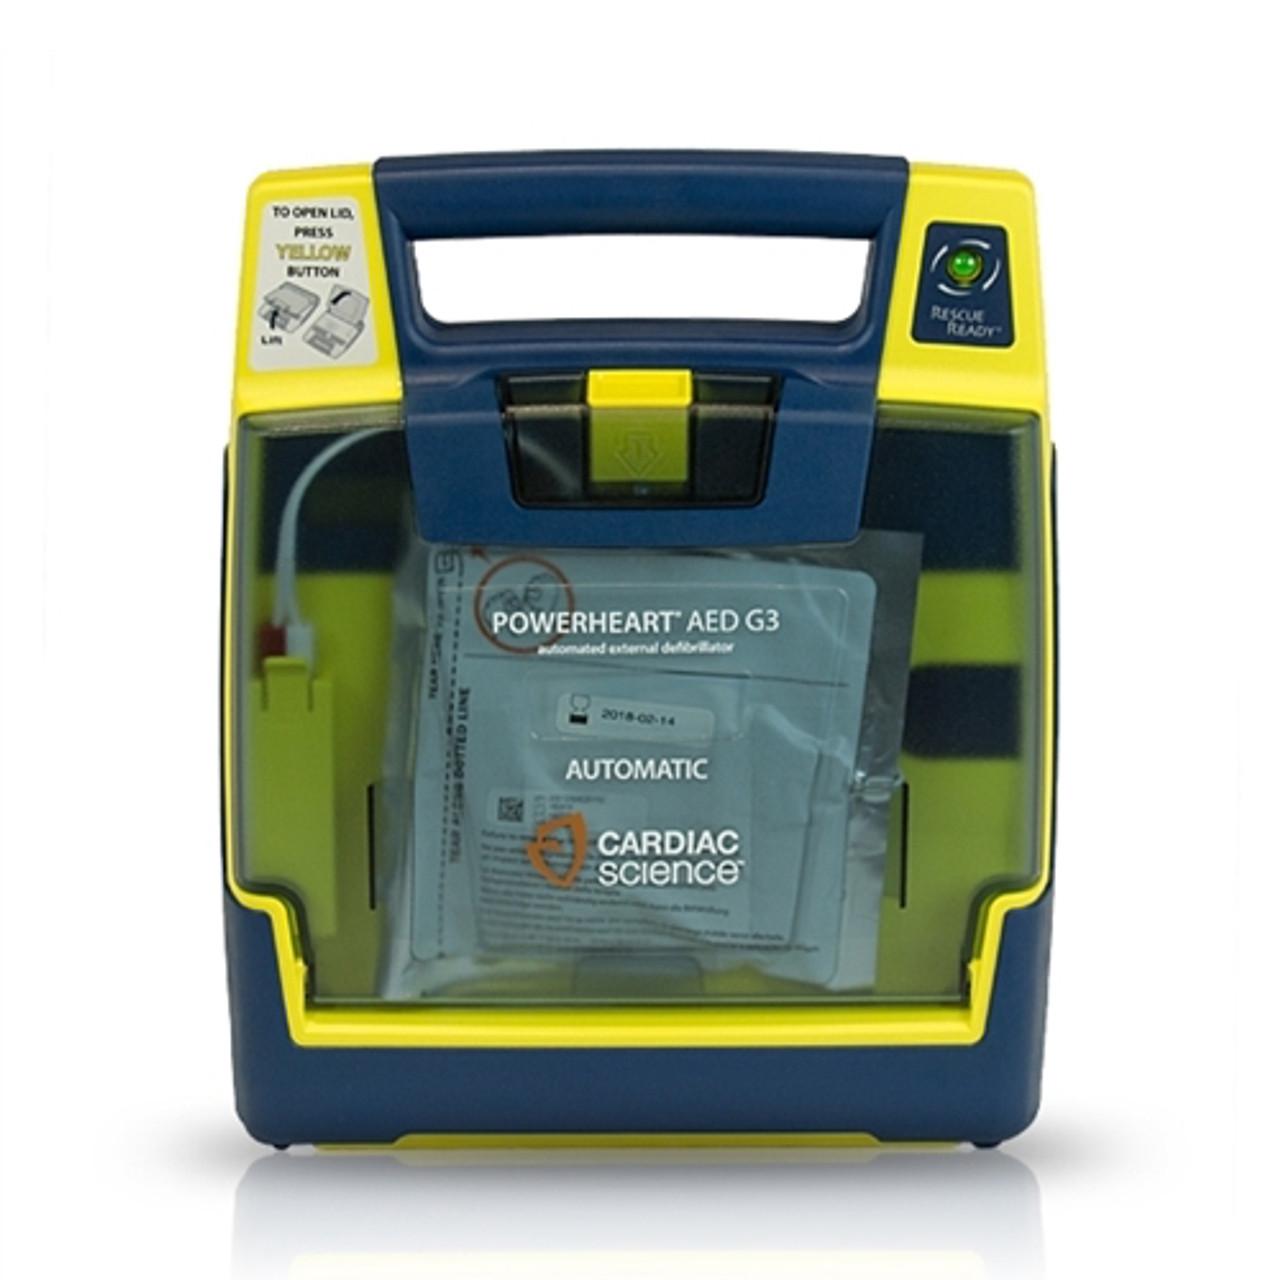 Cardiac Science Powerheart AED G3 Plus